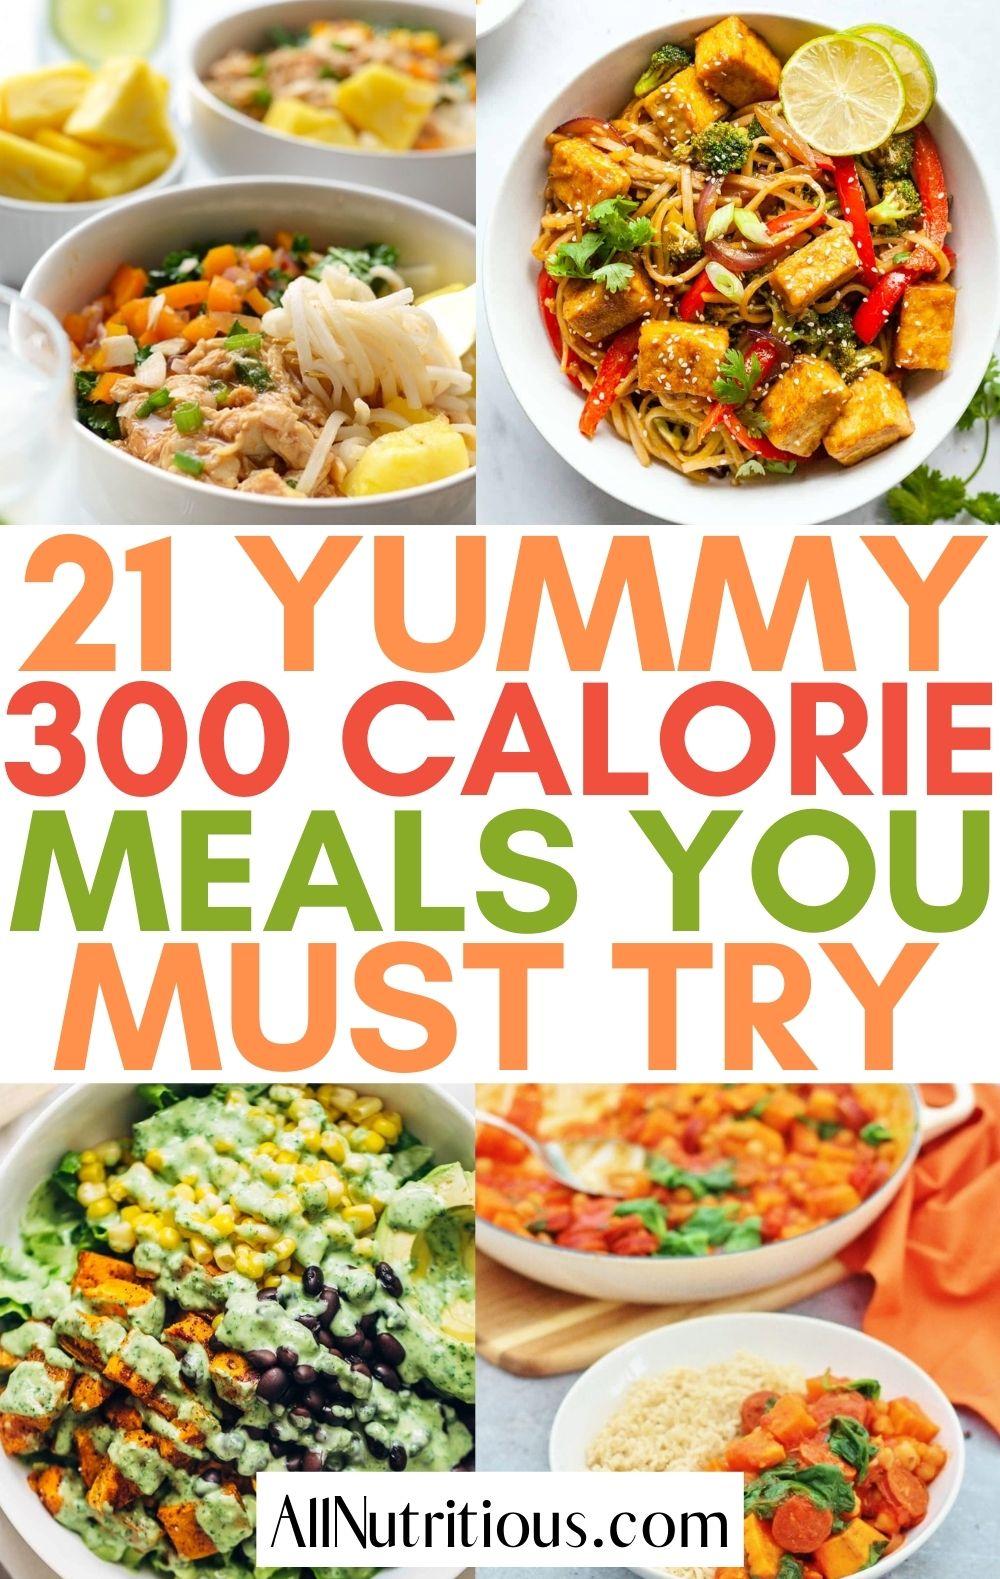 300 calorie meal ideas